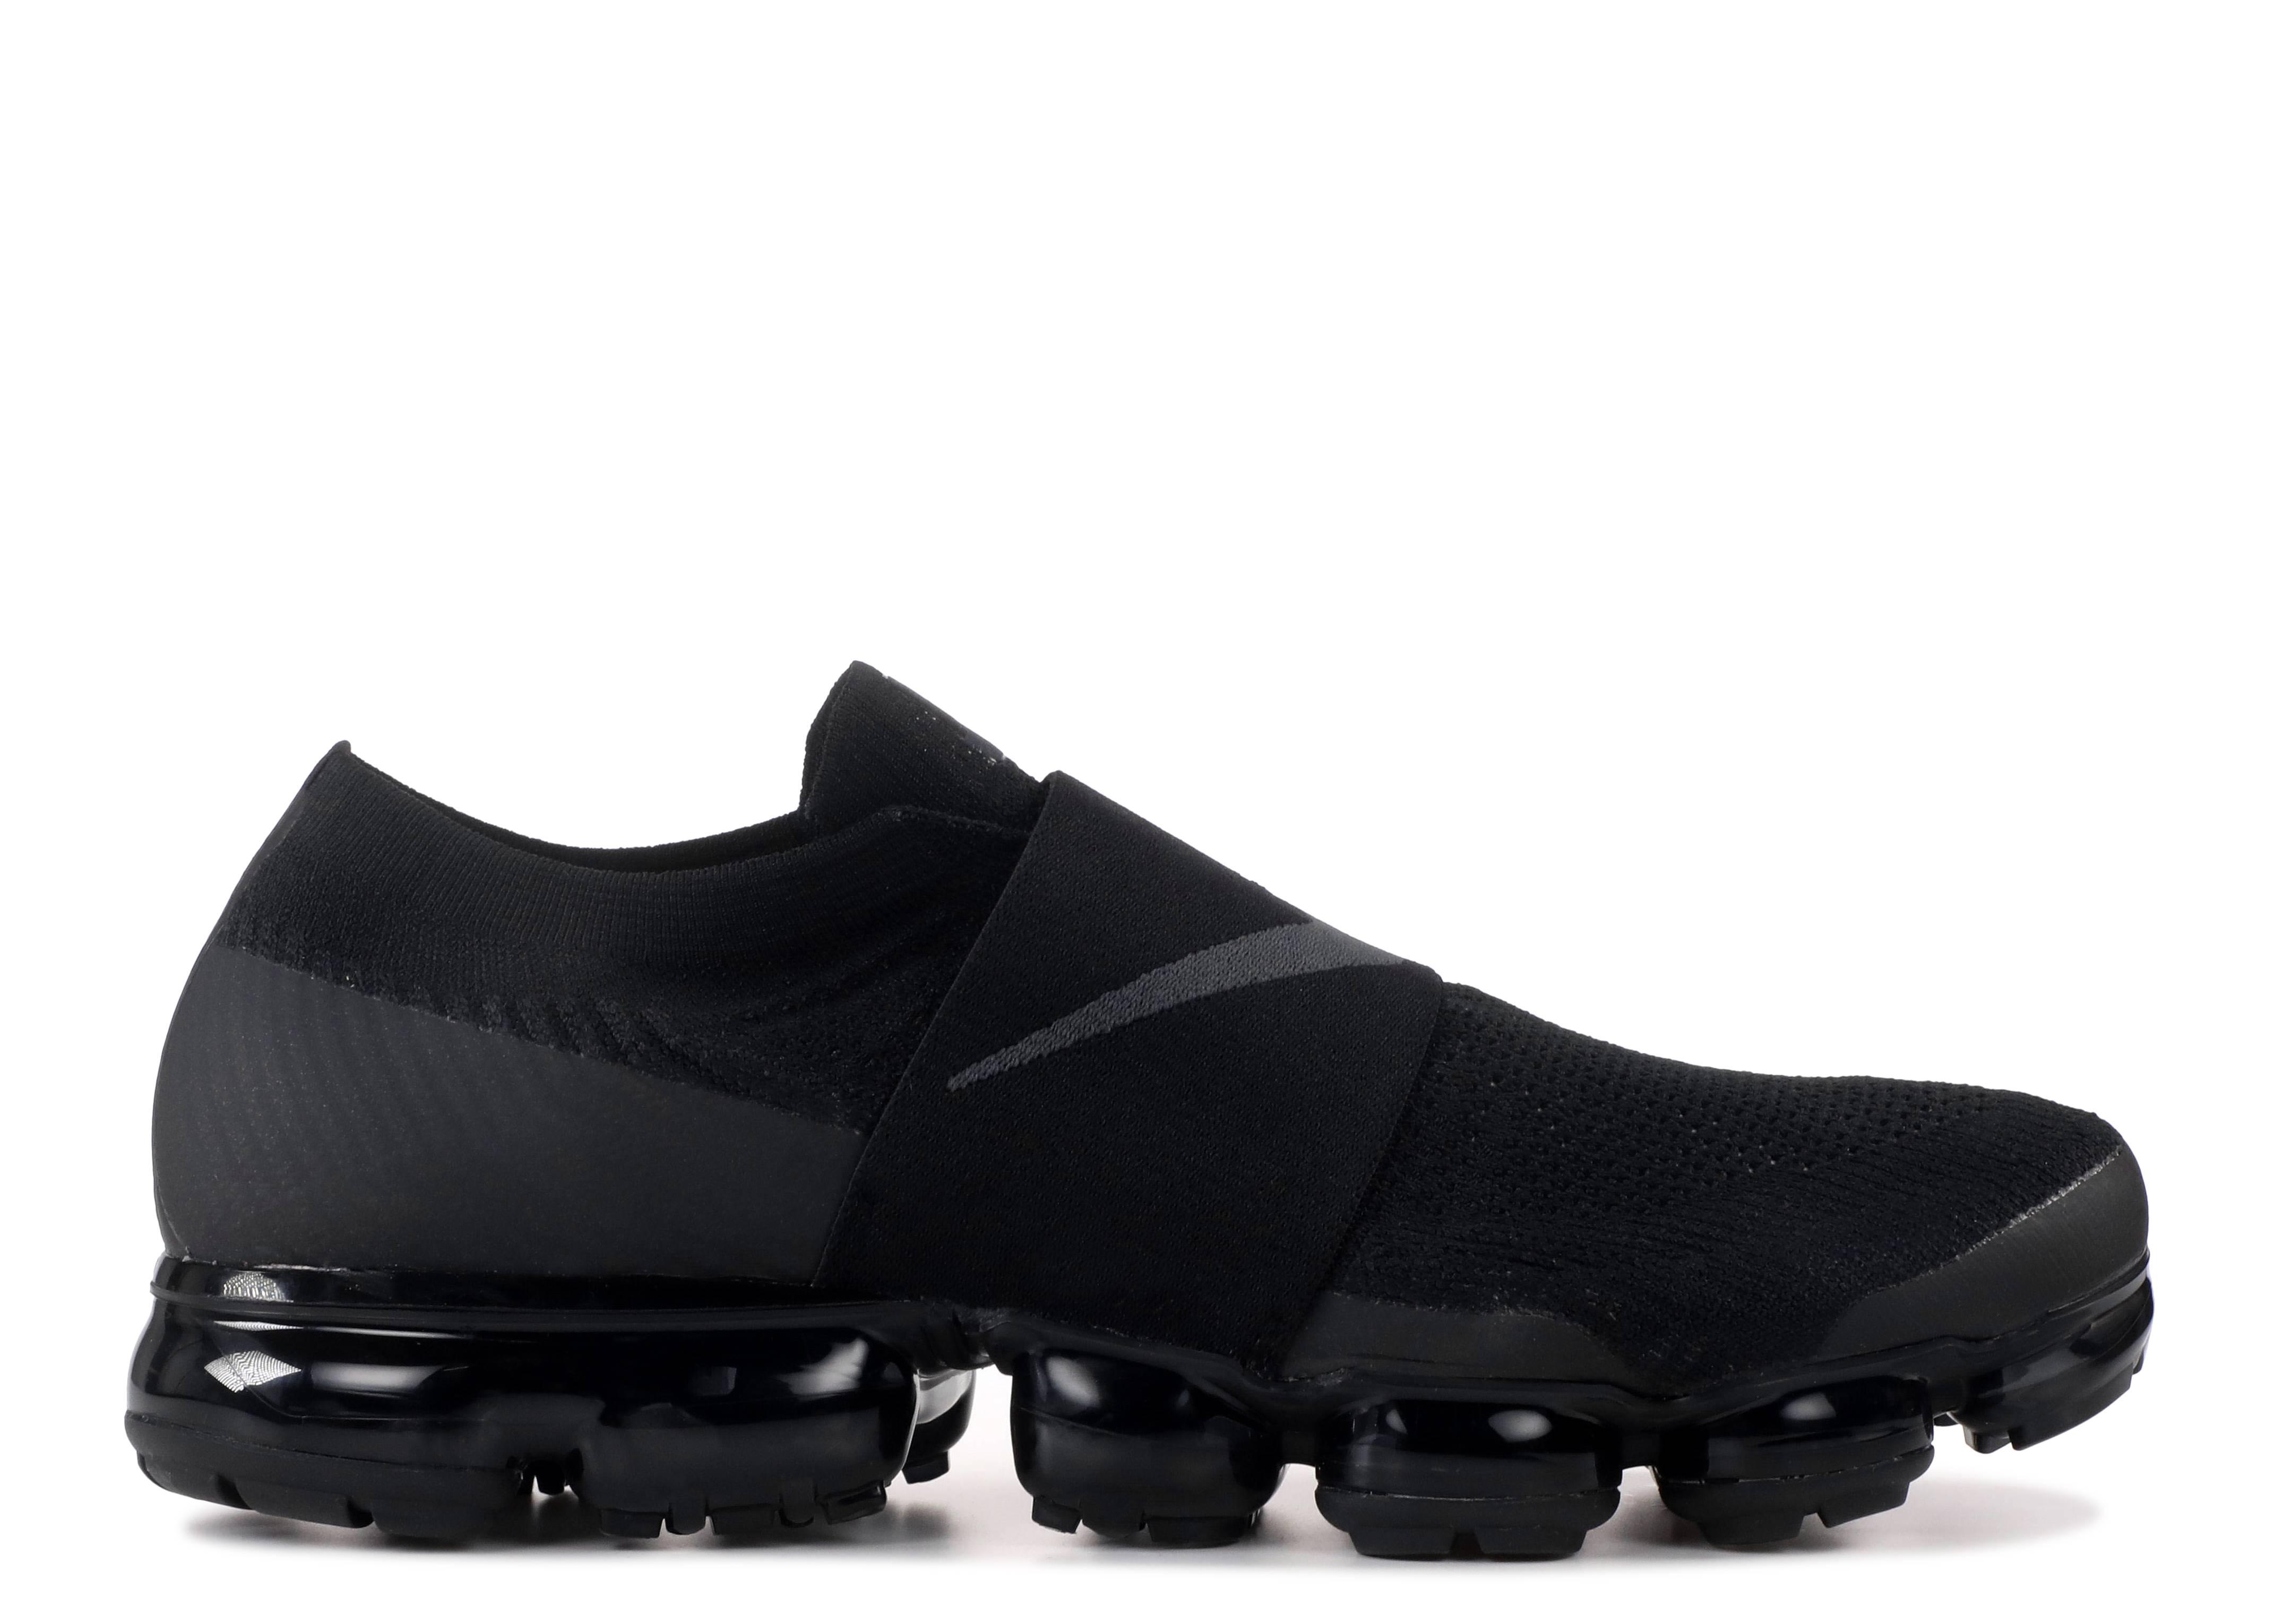 Nike Air Vapormax Flyknit Moc - Adidas - AH3397 004 - black/anthracite |  Flight Club